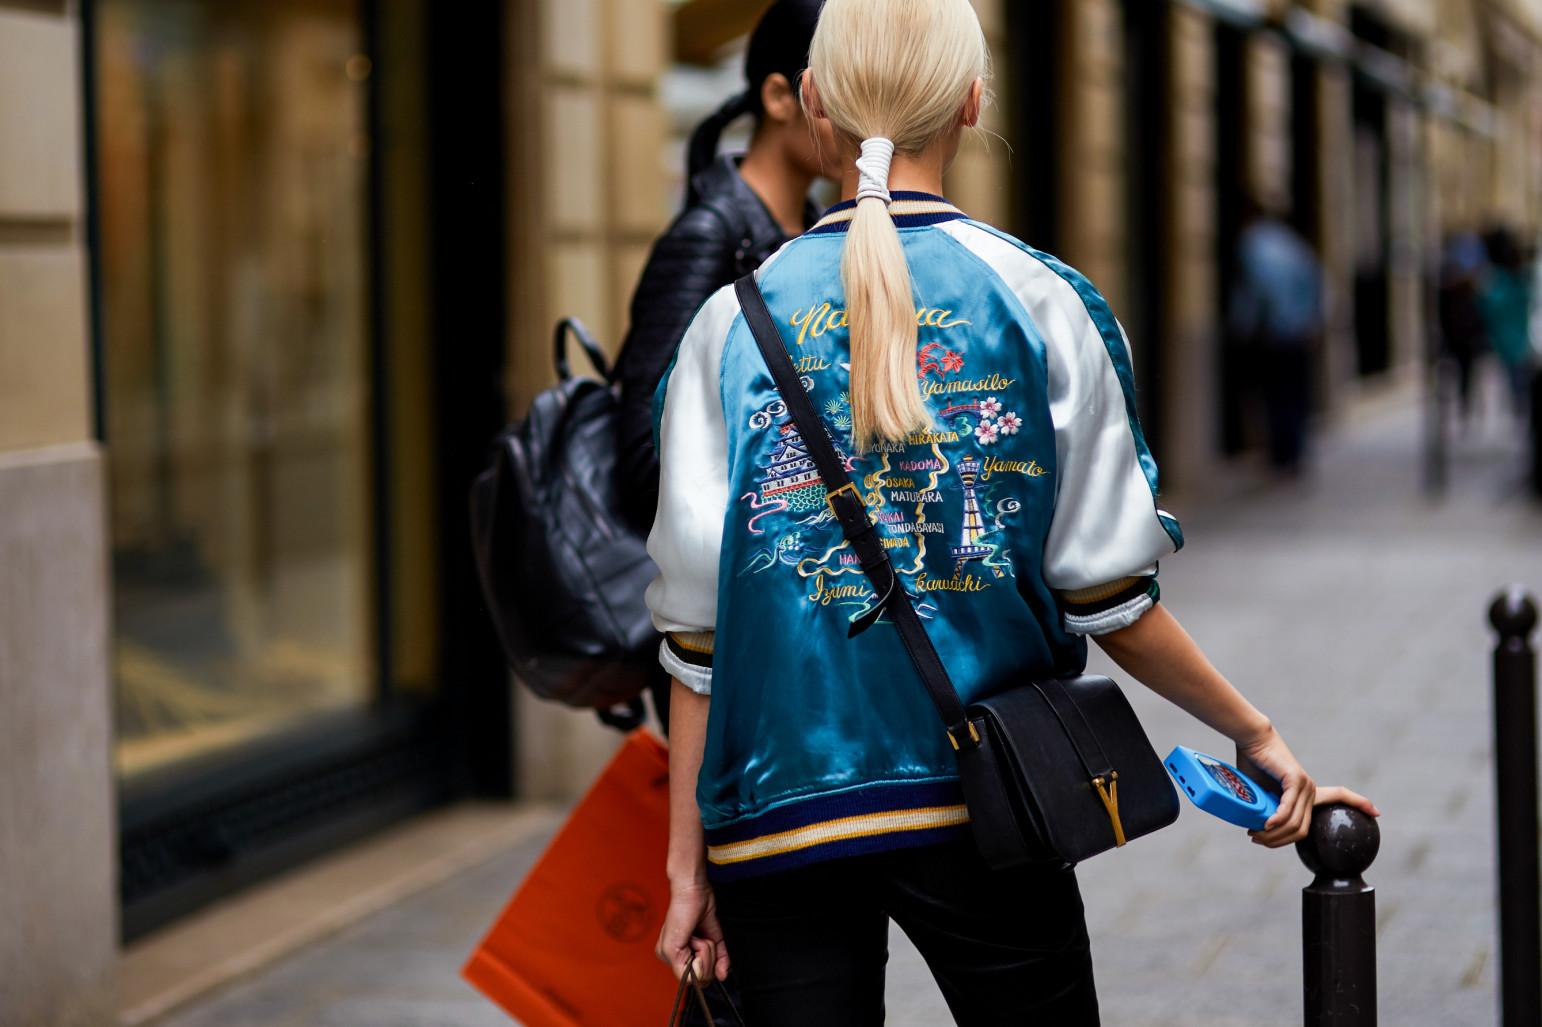 ShotByGio-George-Angelis-Paris-Haute-Couture-Fashion-Week-Fall-2016-4574-1542x1027.jpg